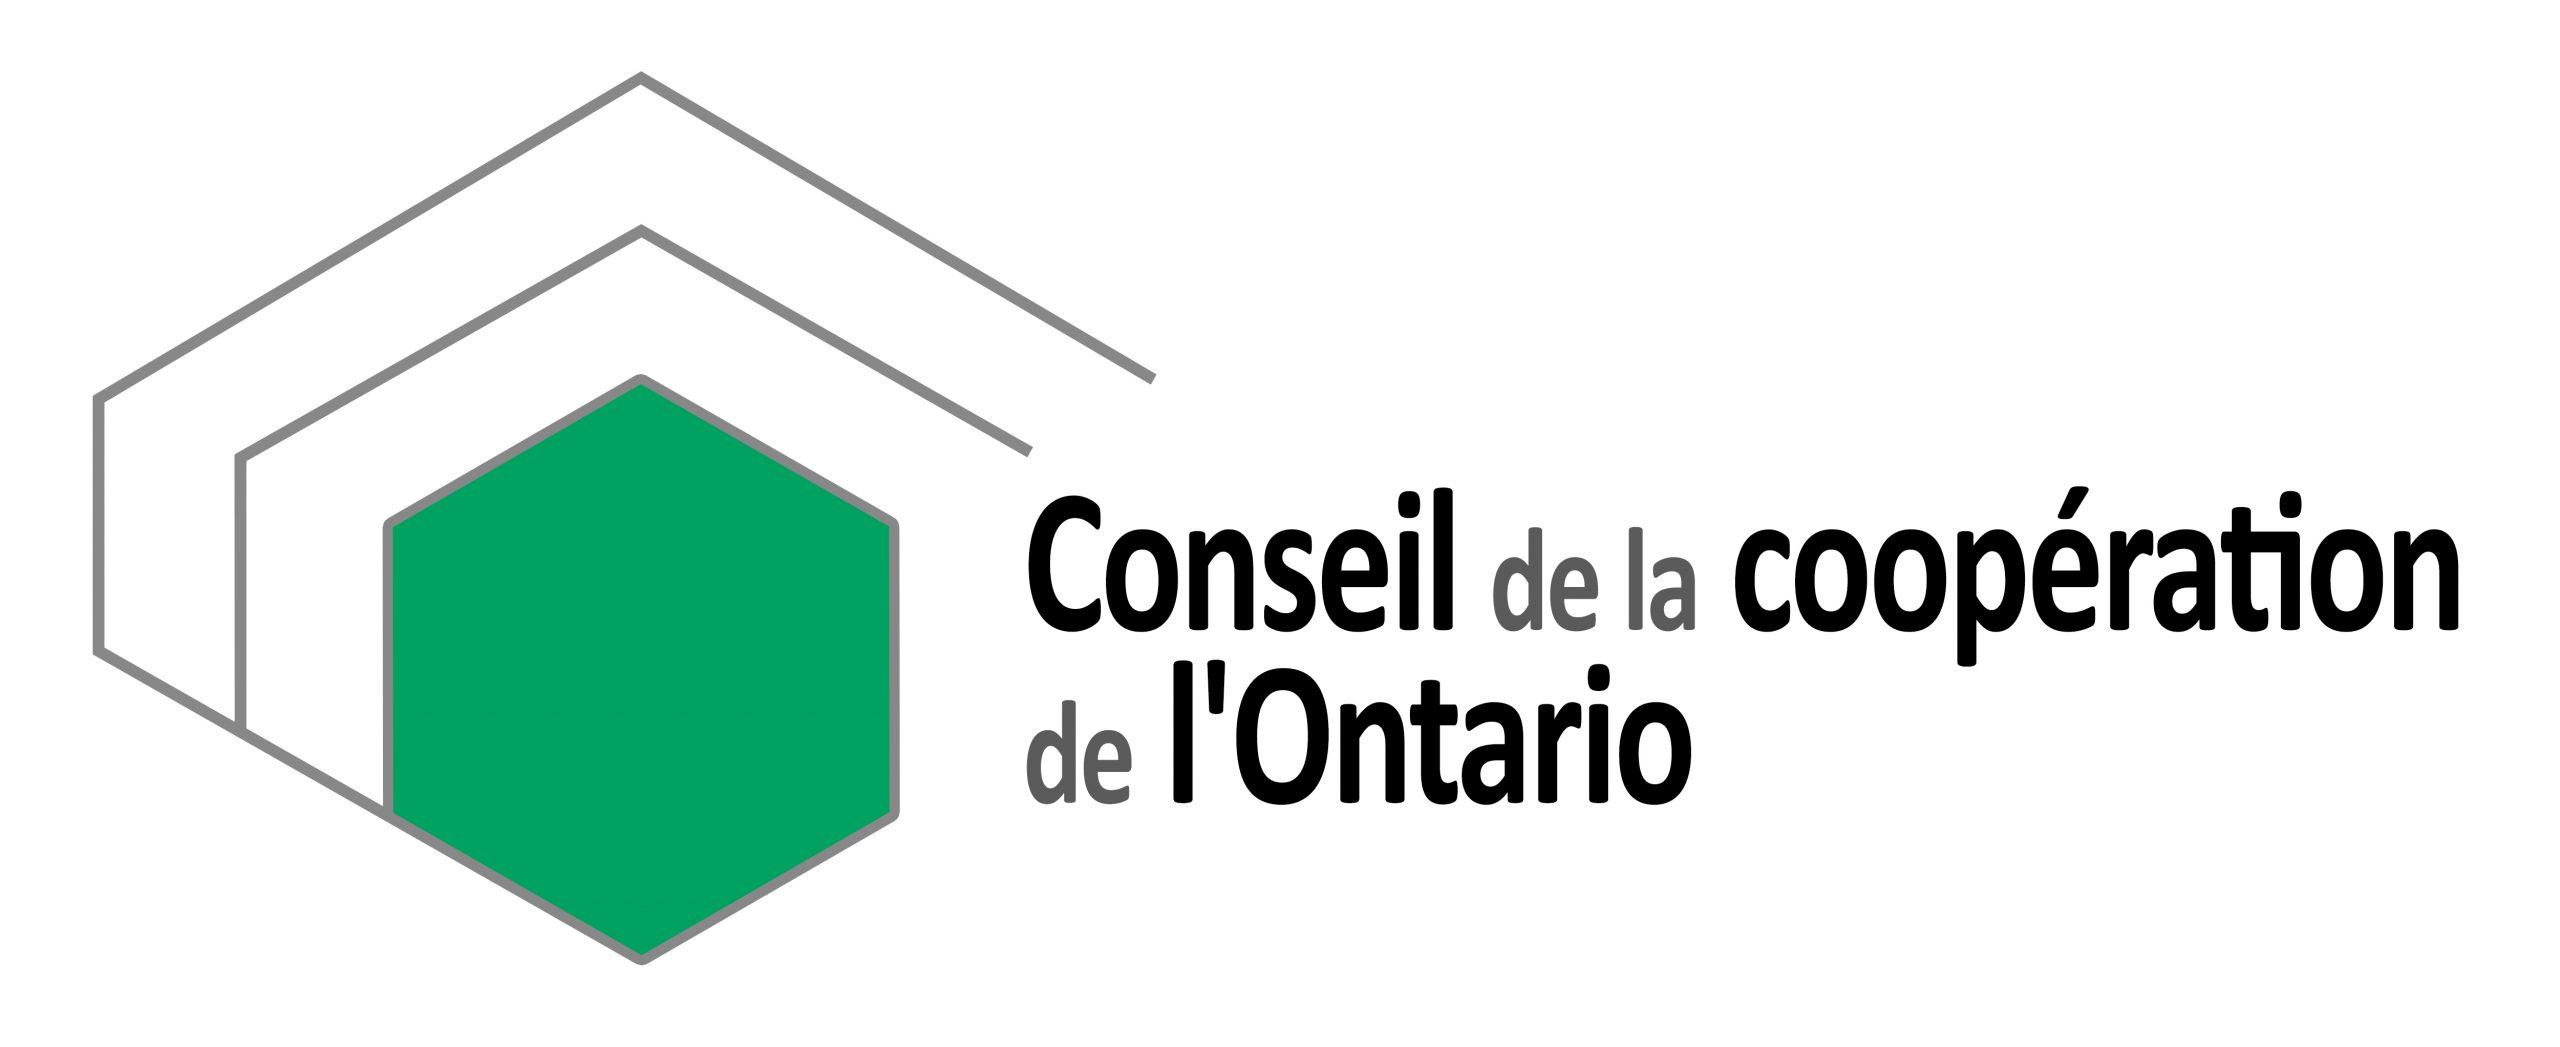 Conseil de la coopération de l'Ontario (CCO) - https://www.cco.coop/